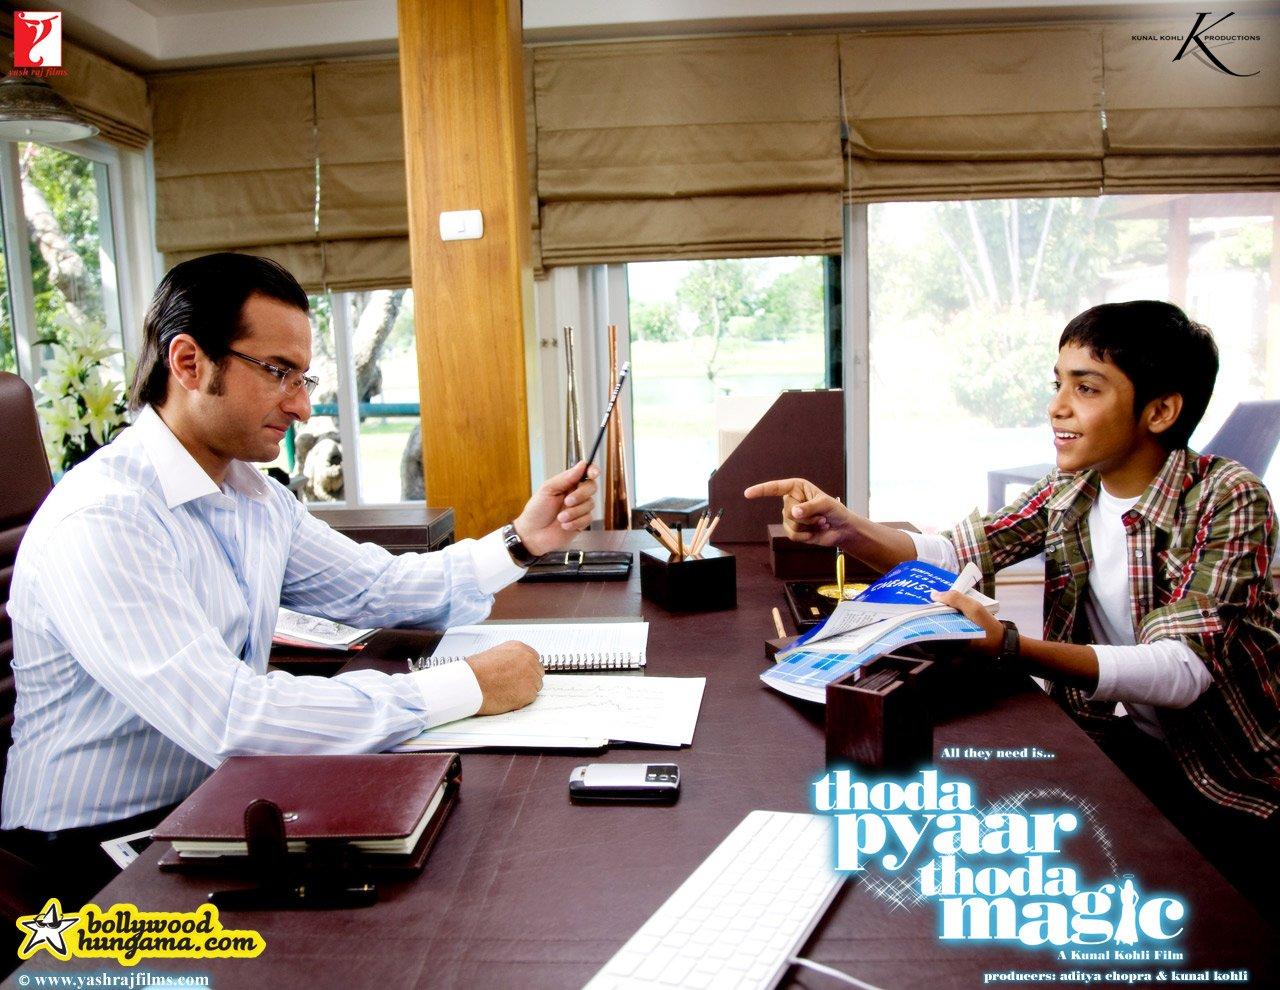 http://i.indiafm.com/posters/movies/08/thodapyaarthodamagic/still21.jpg